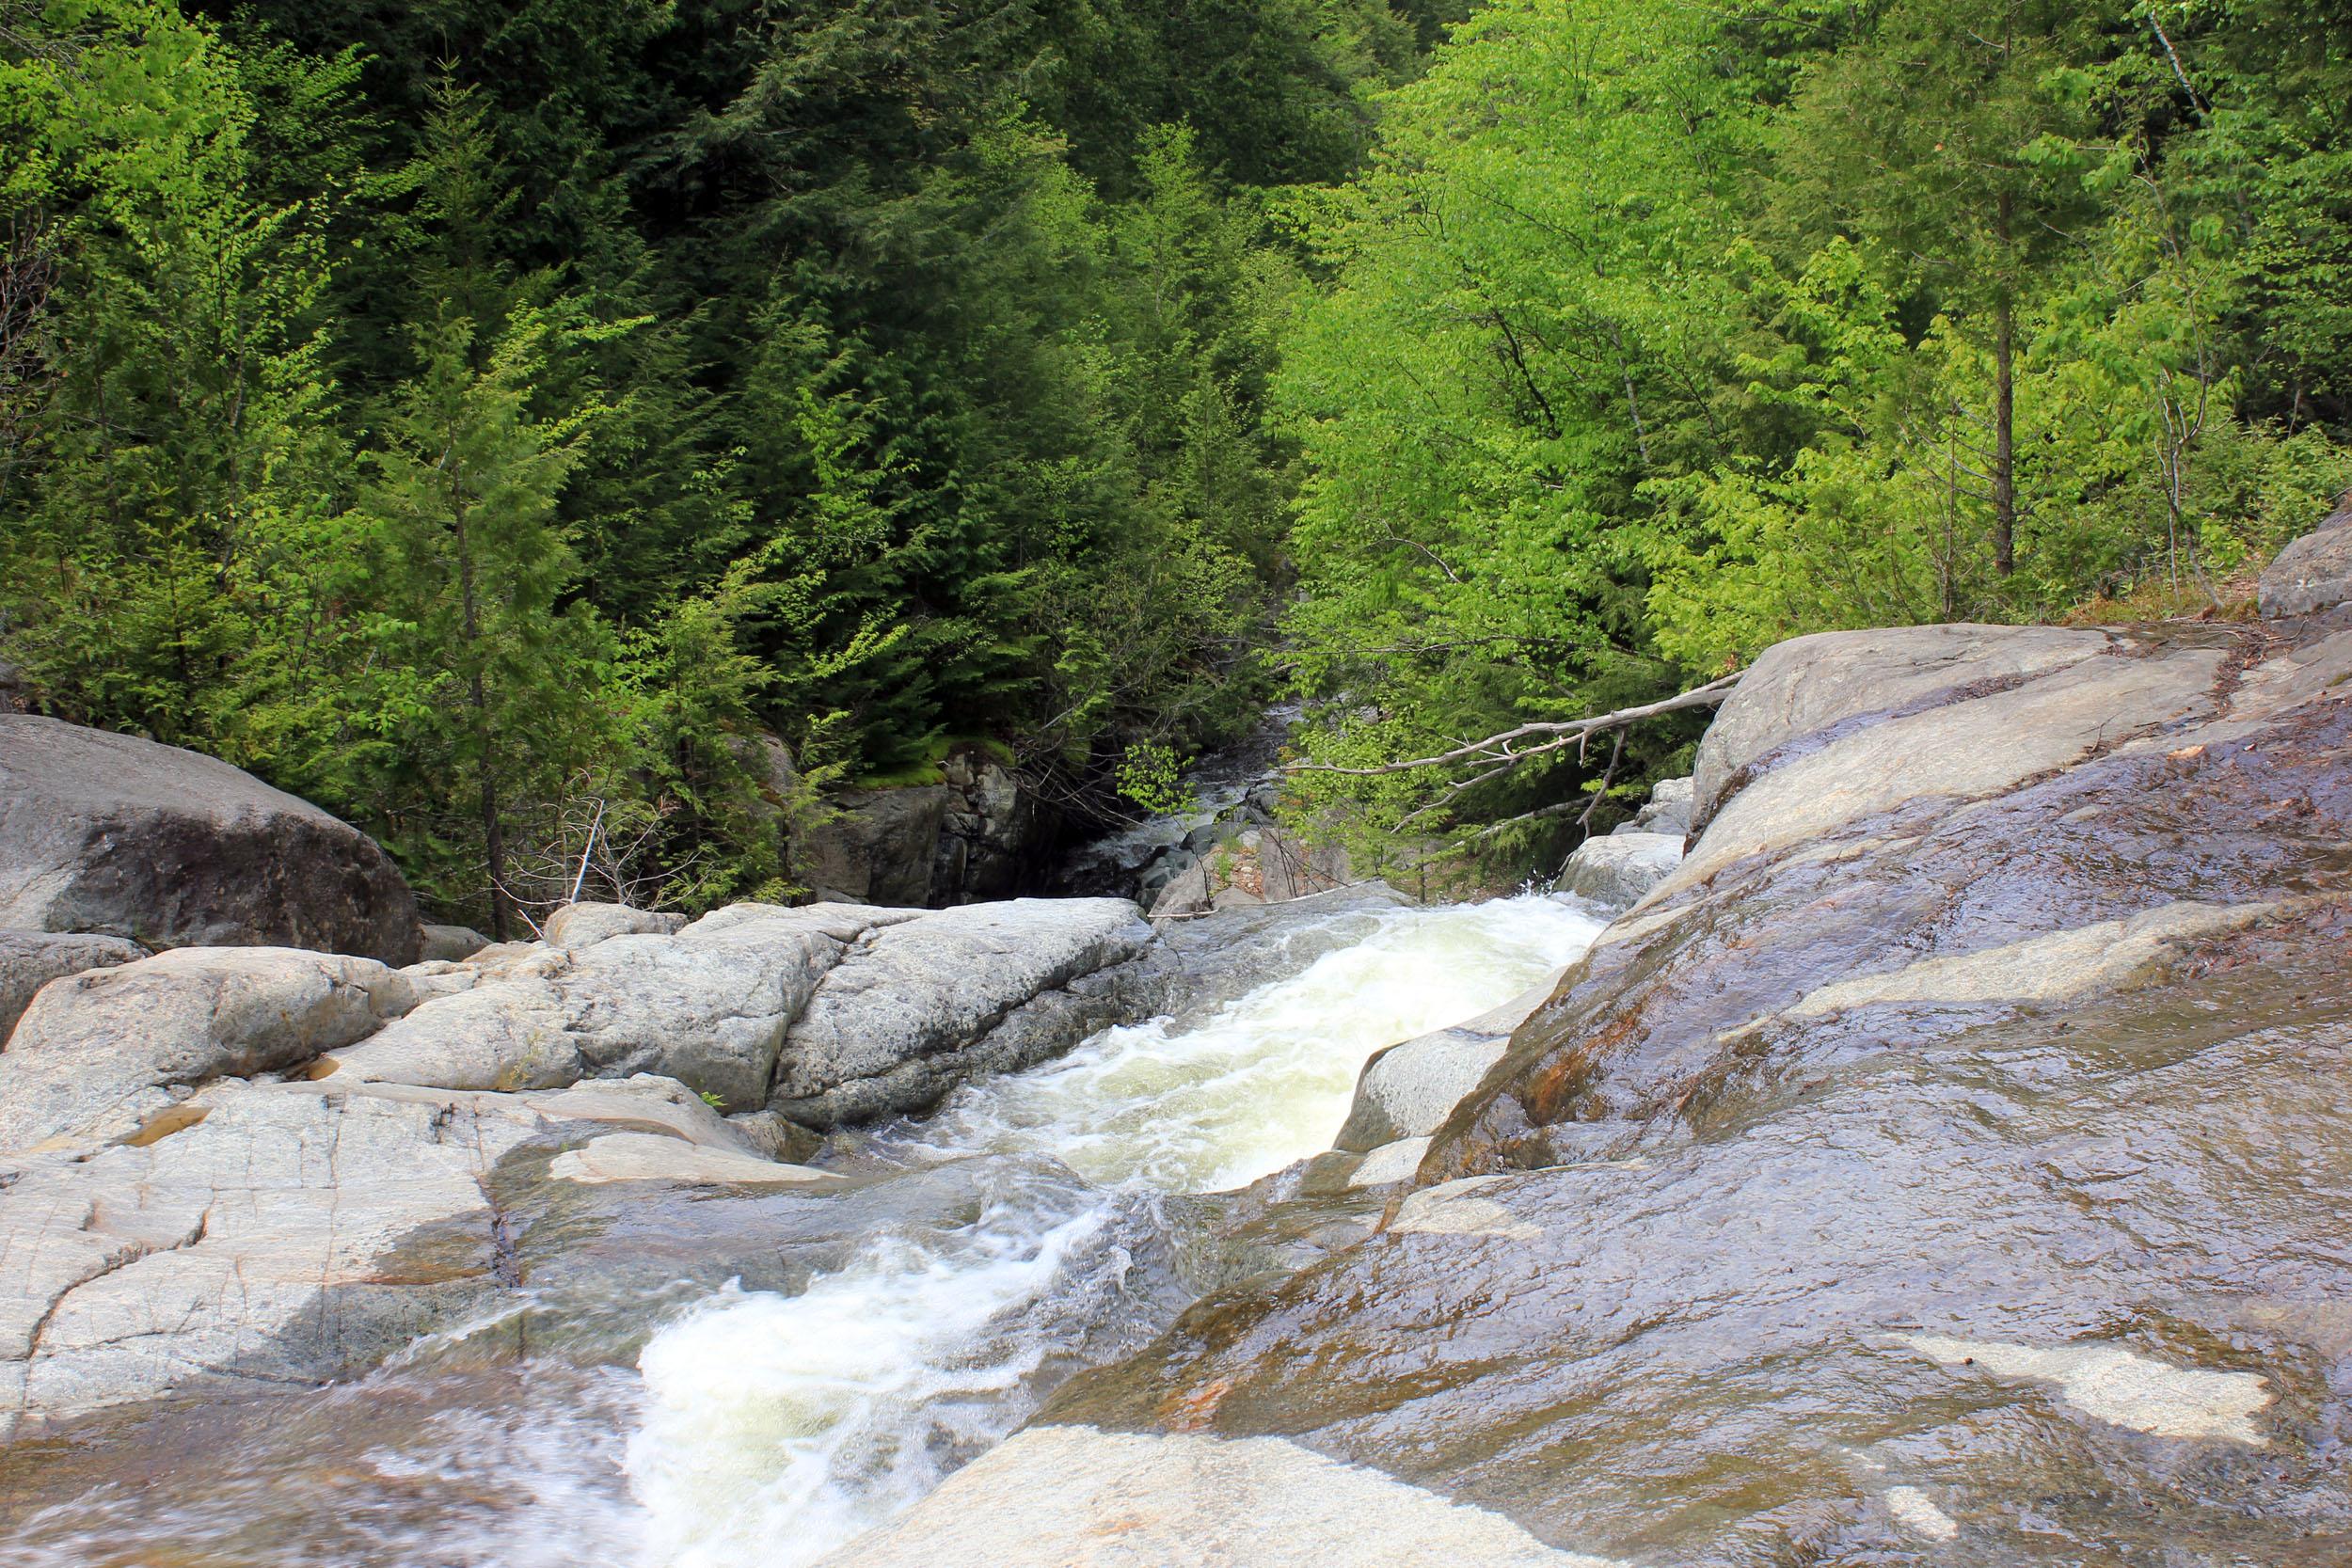 High Falls Gorge in Adirondack Mountains, New York #